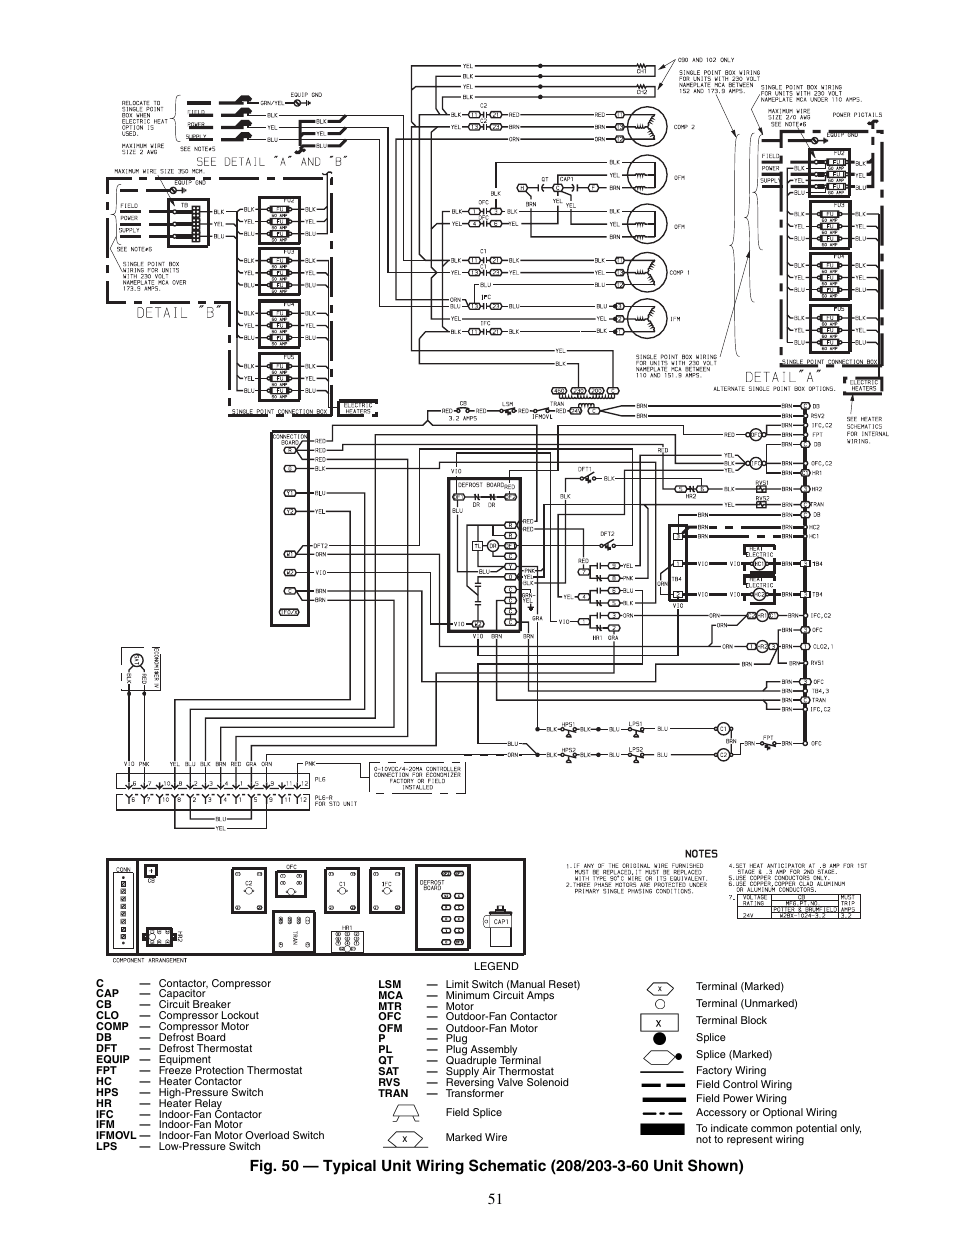 Carrier Clo Board Wiring Diagram : 32 Wiring Diagram